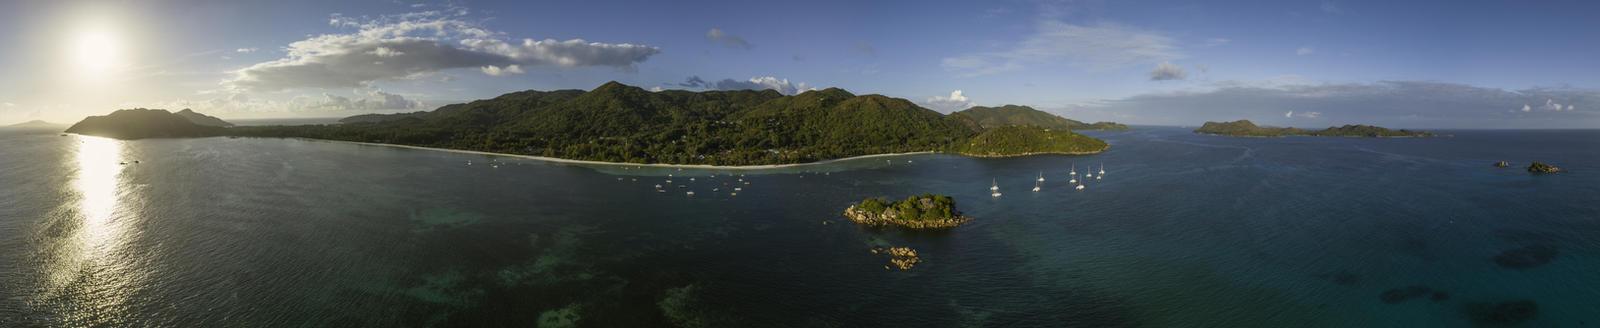 Seychelles Praslin Island by fly10